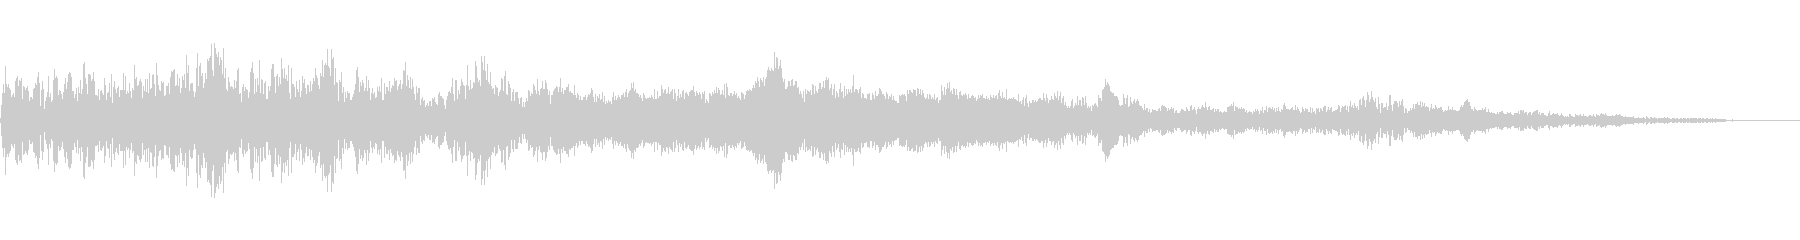 SynthSweep EC06_61_1の未再生の波形